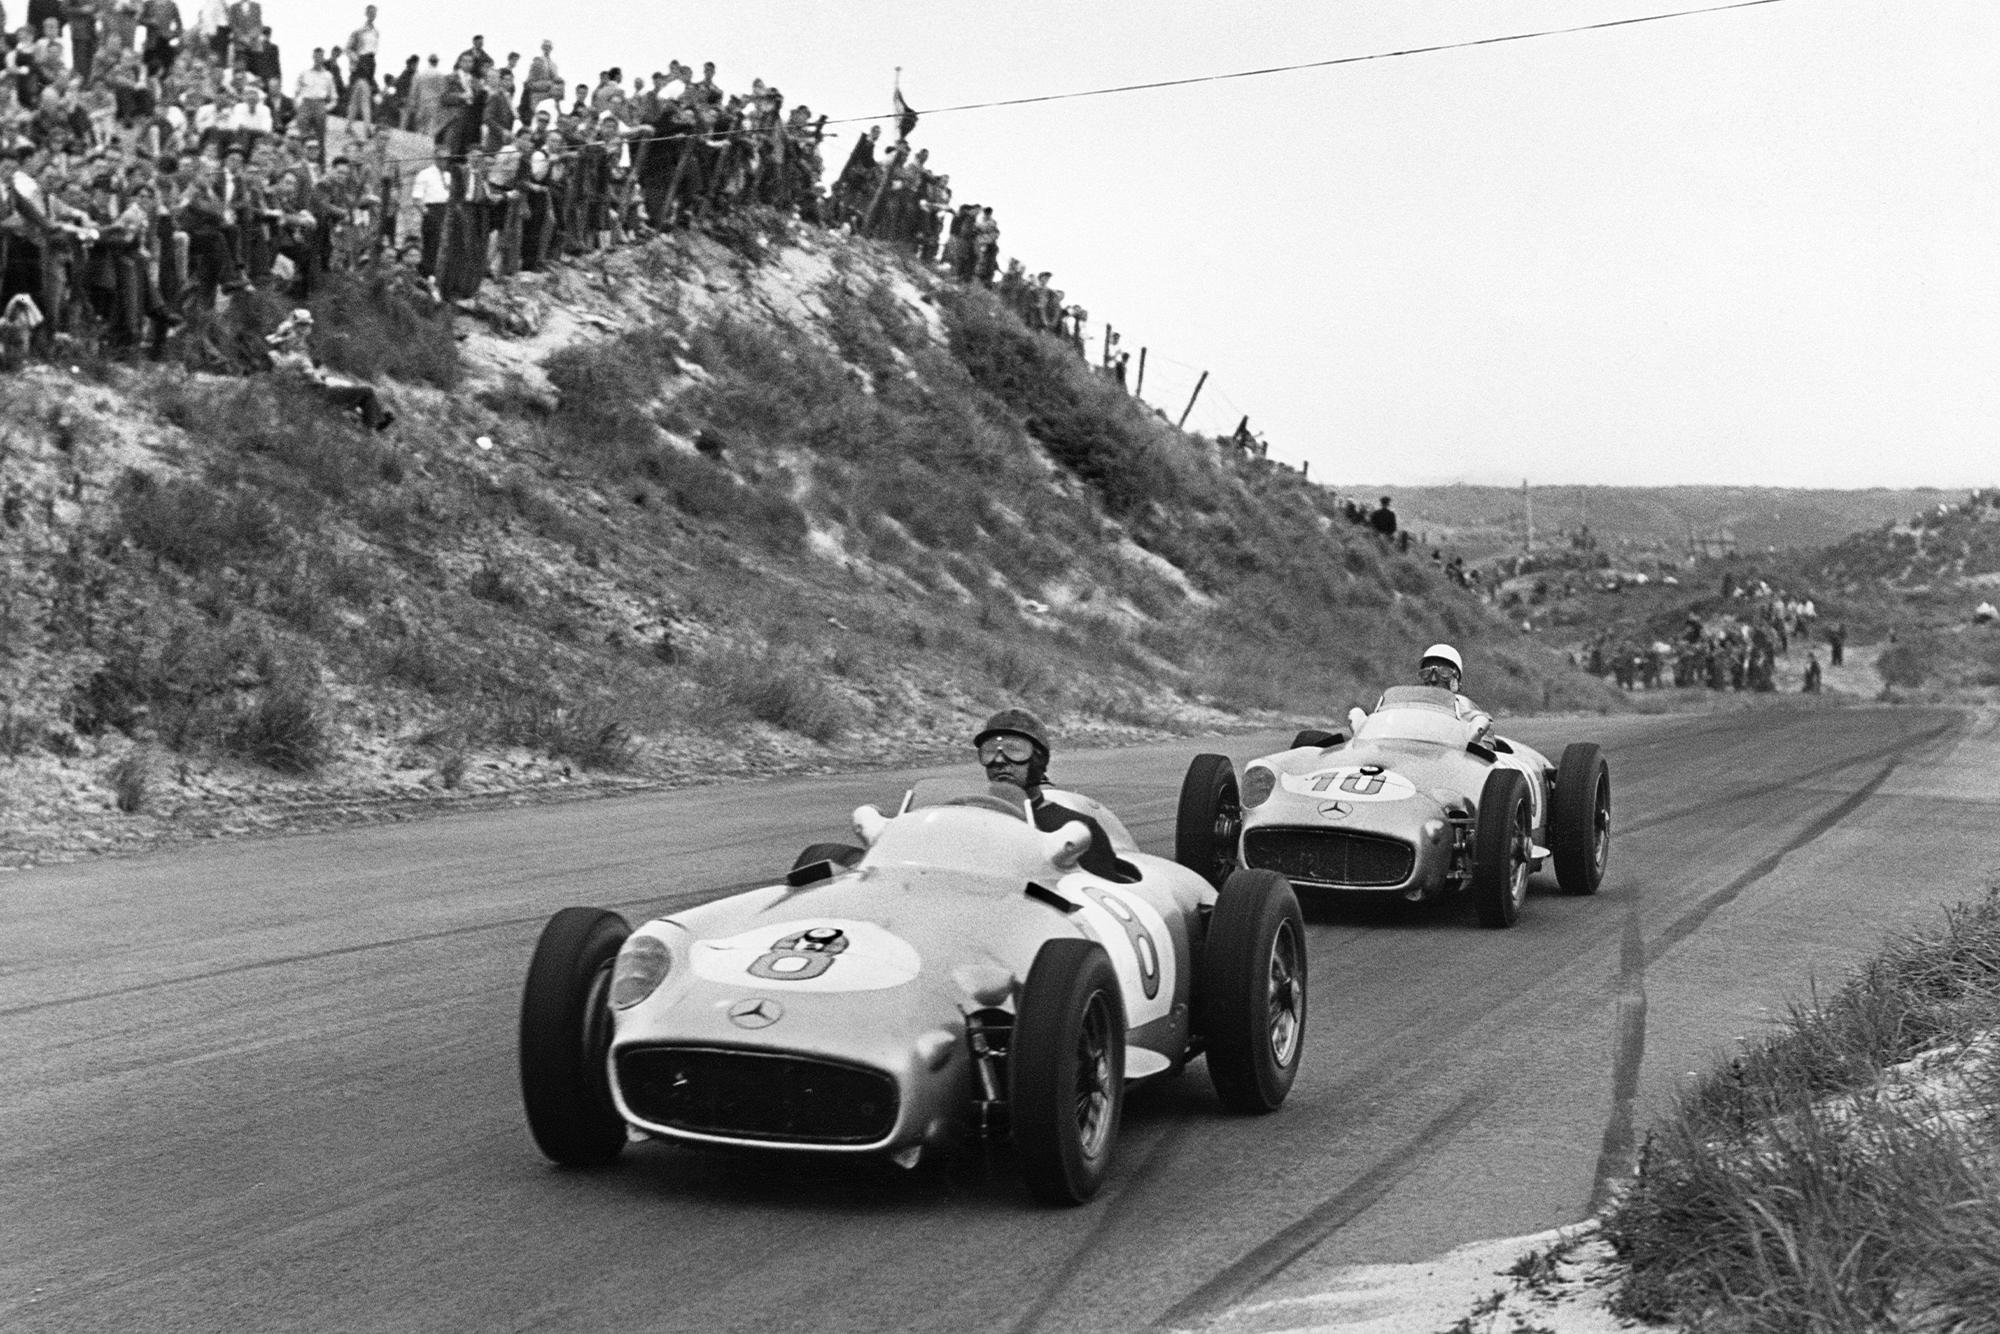 Juan Manuel Fangio (Mercedes-Benz W196),1st position, leads Stirling Moss (Mercedes-Benz W196), 2nd position at the 1955 Dutch Grand Prix, Zandvoort.